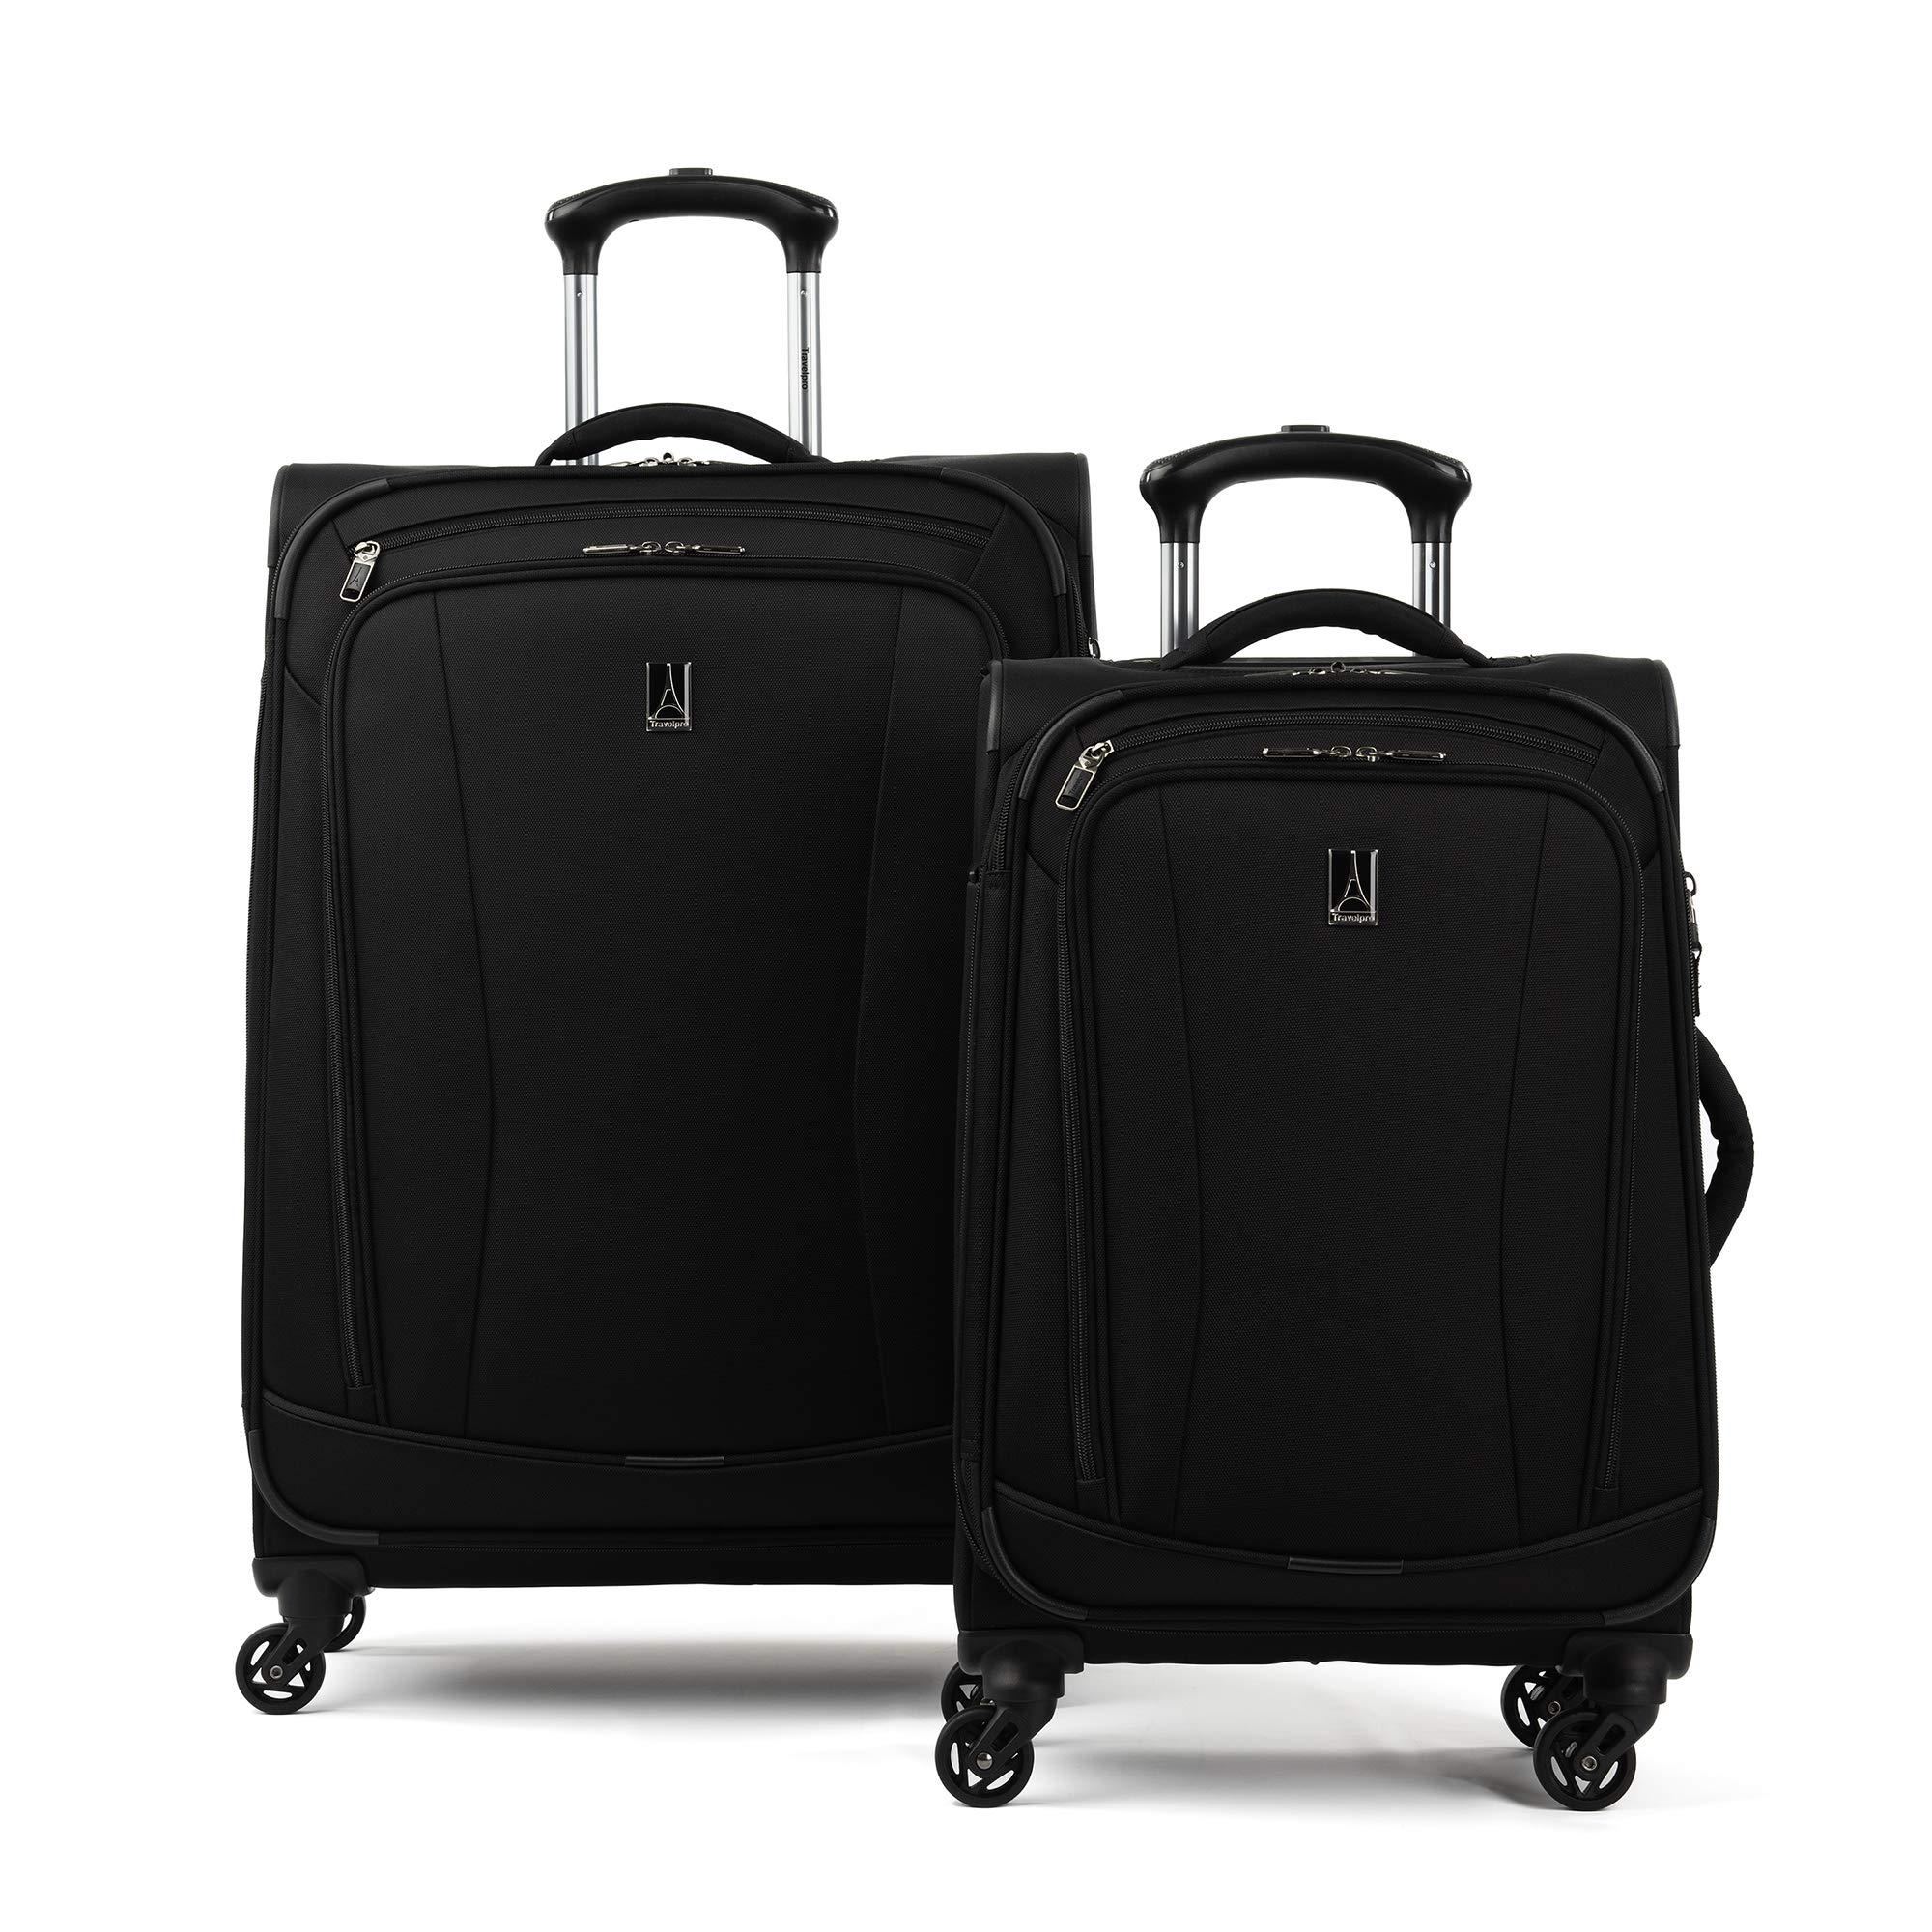 Travelpro TourGo Softside Spinner Luggage